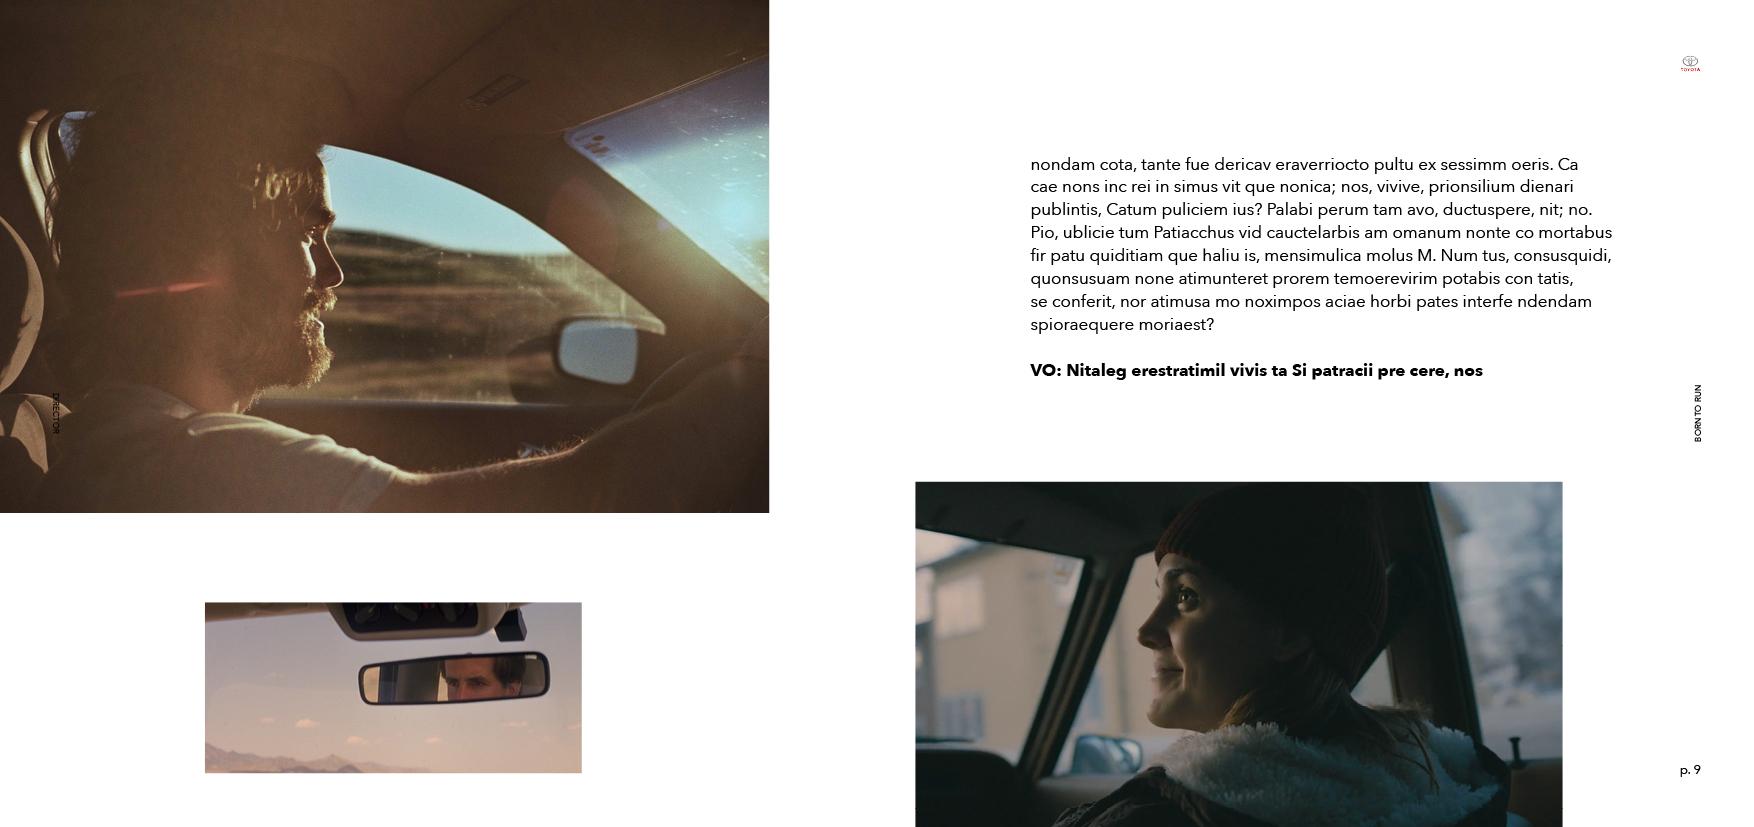 CAR_BLANKED_19.jpg